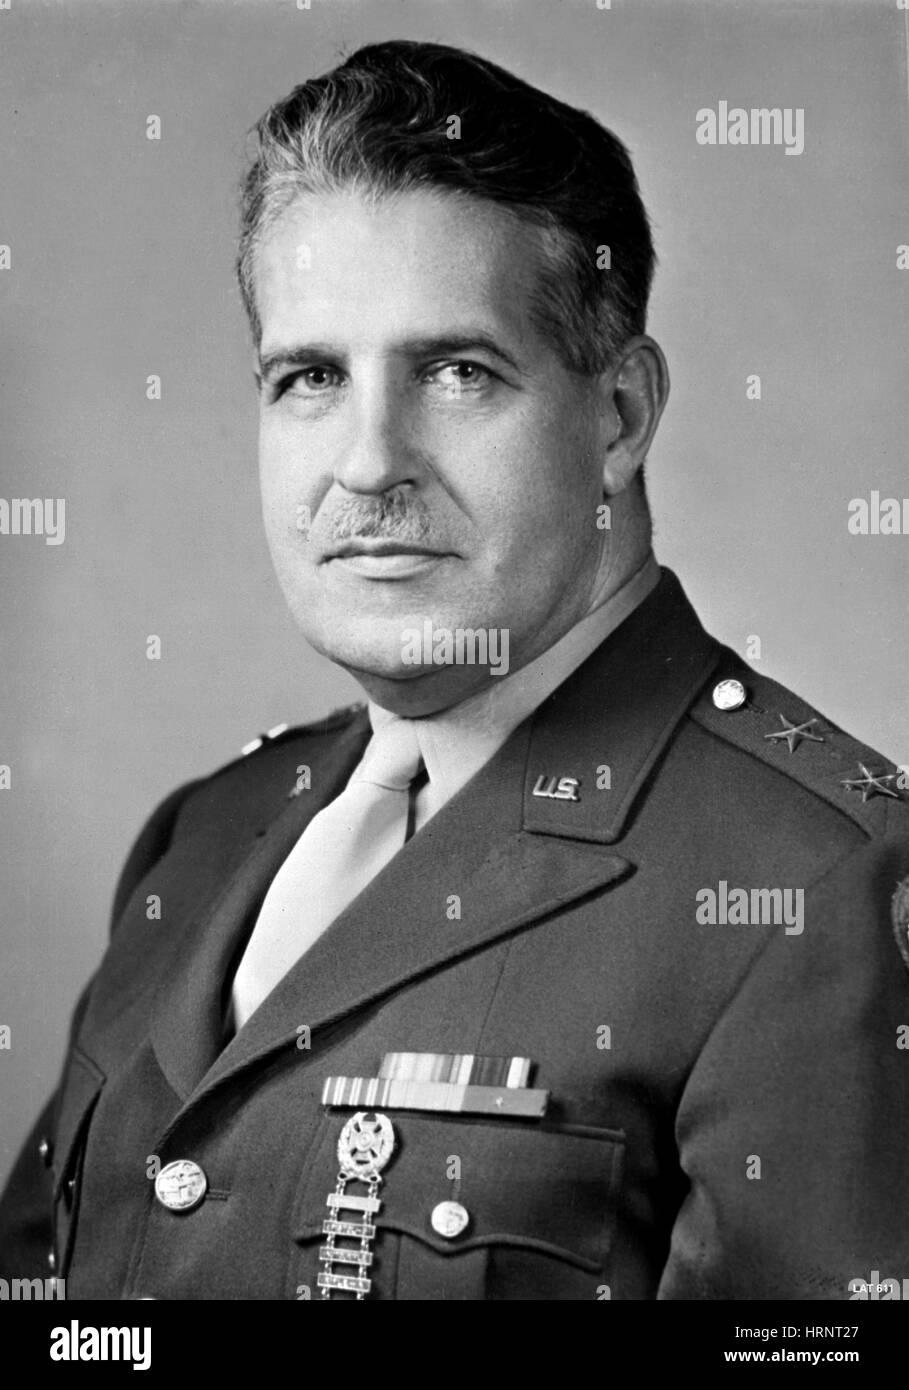 Leslie Groves, U.S. Army Officer - Stock Image